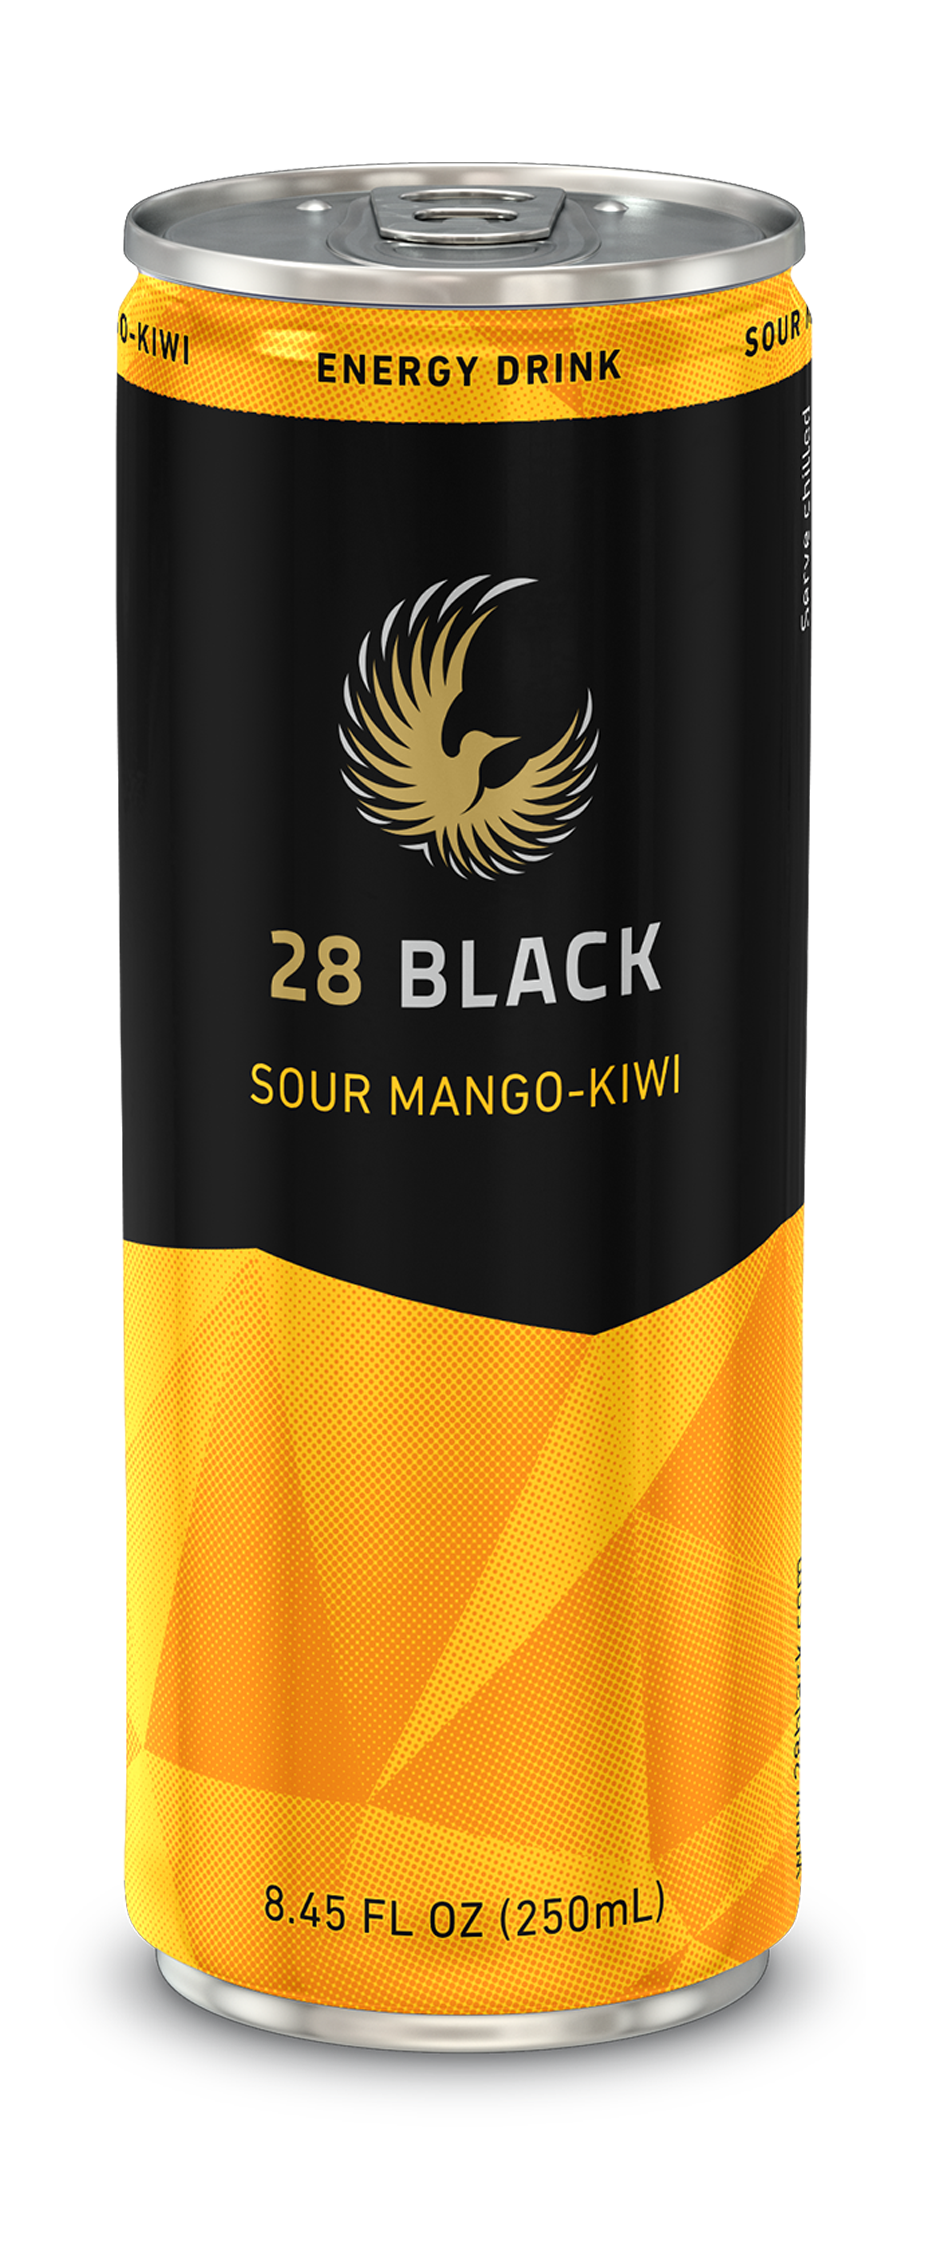 Rock Solid - 28 BLACK Energy Drink Southeast Distributors